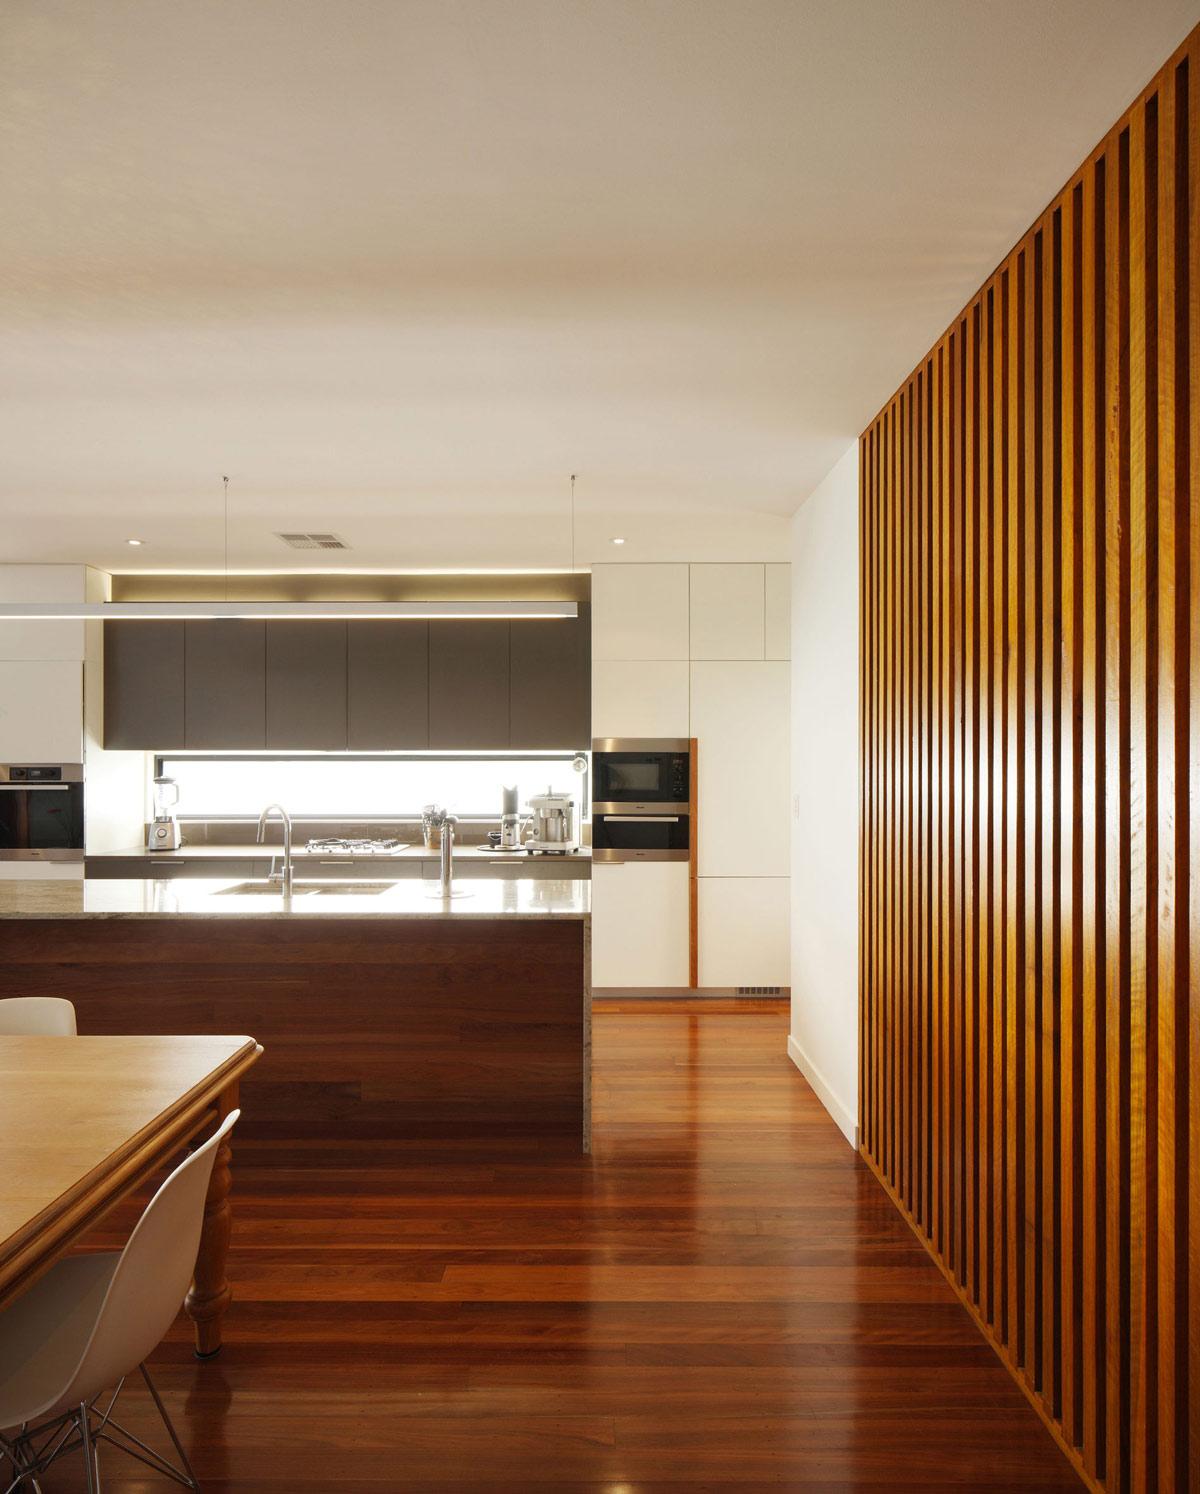 Wood Flooring, Walls, Modern Kitchen, Renovation and Extension in Chelmer, Brisbane